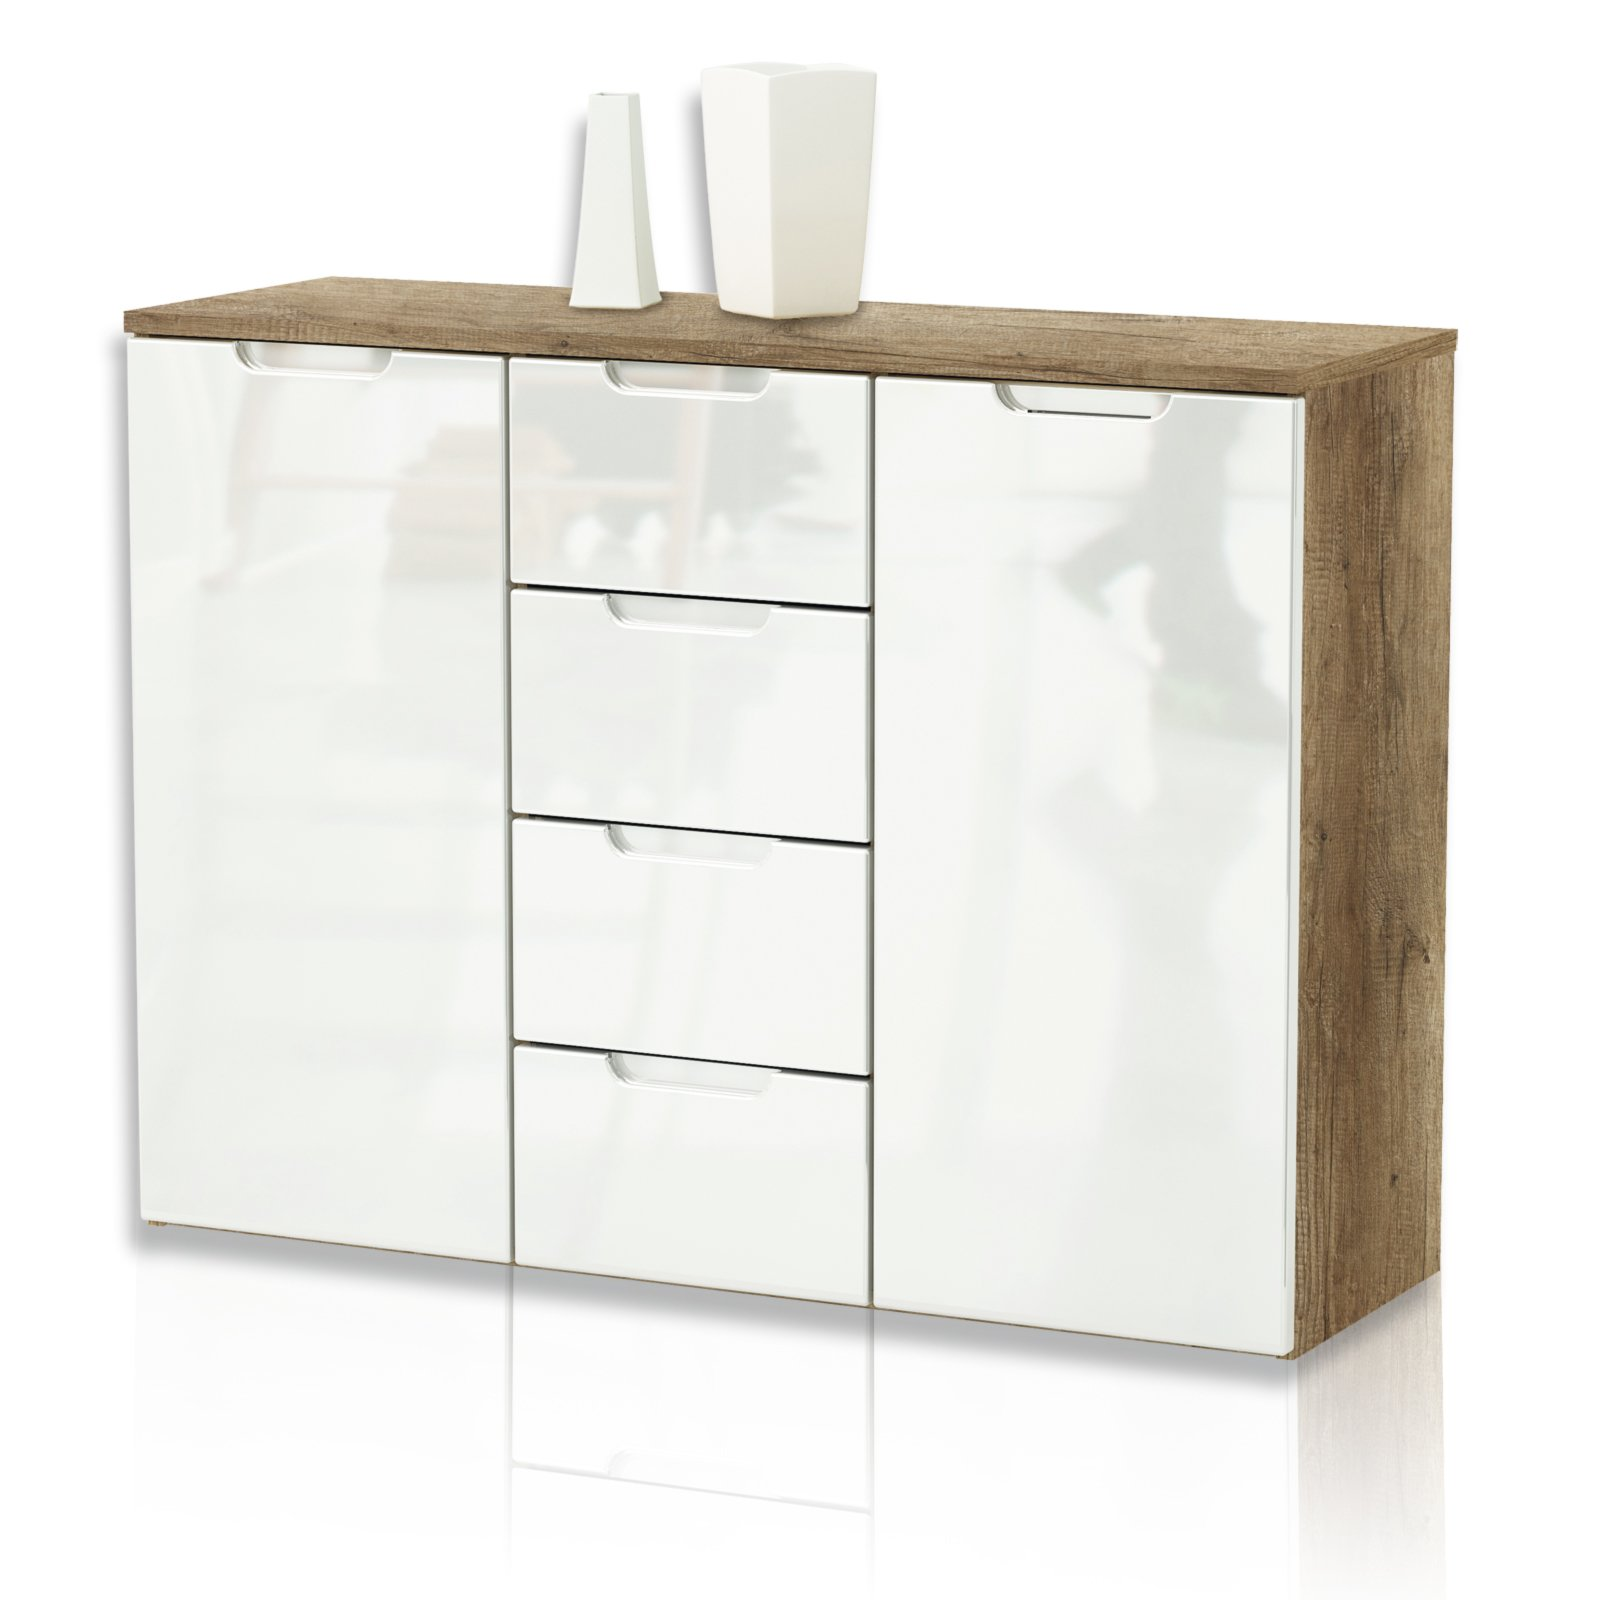 kommode clio eiche antik wei 106 cm kommoden sideboards m bel m belhaus roller. Black Bedroom Furniture Sets. Home Design Ideas